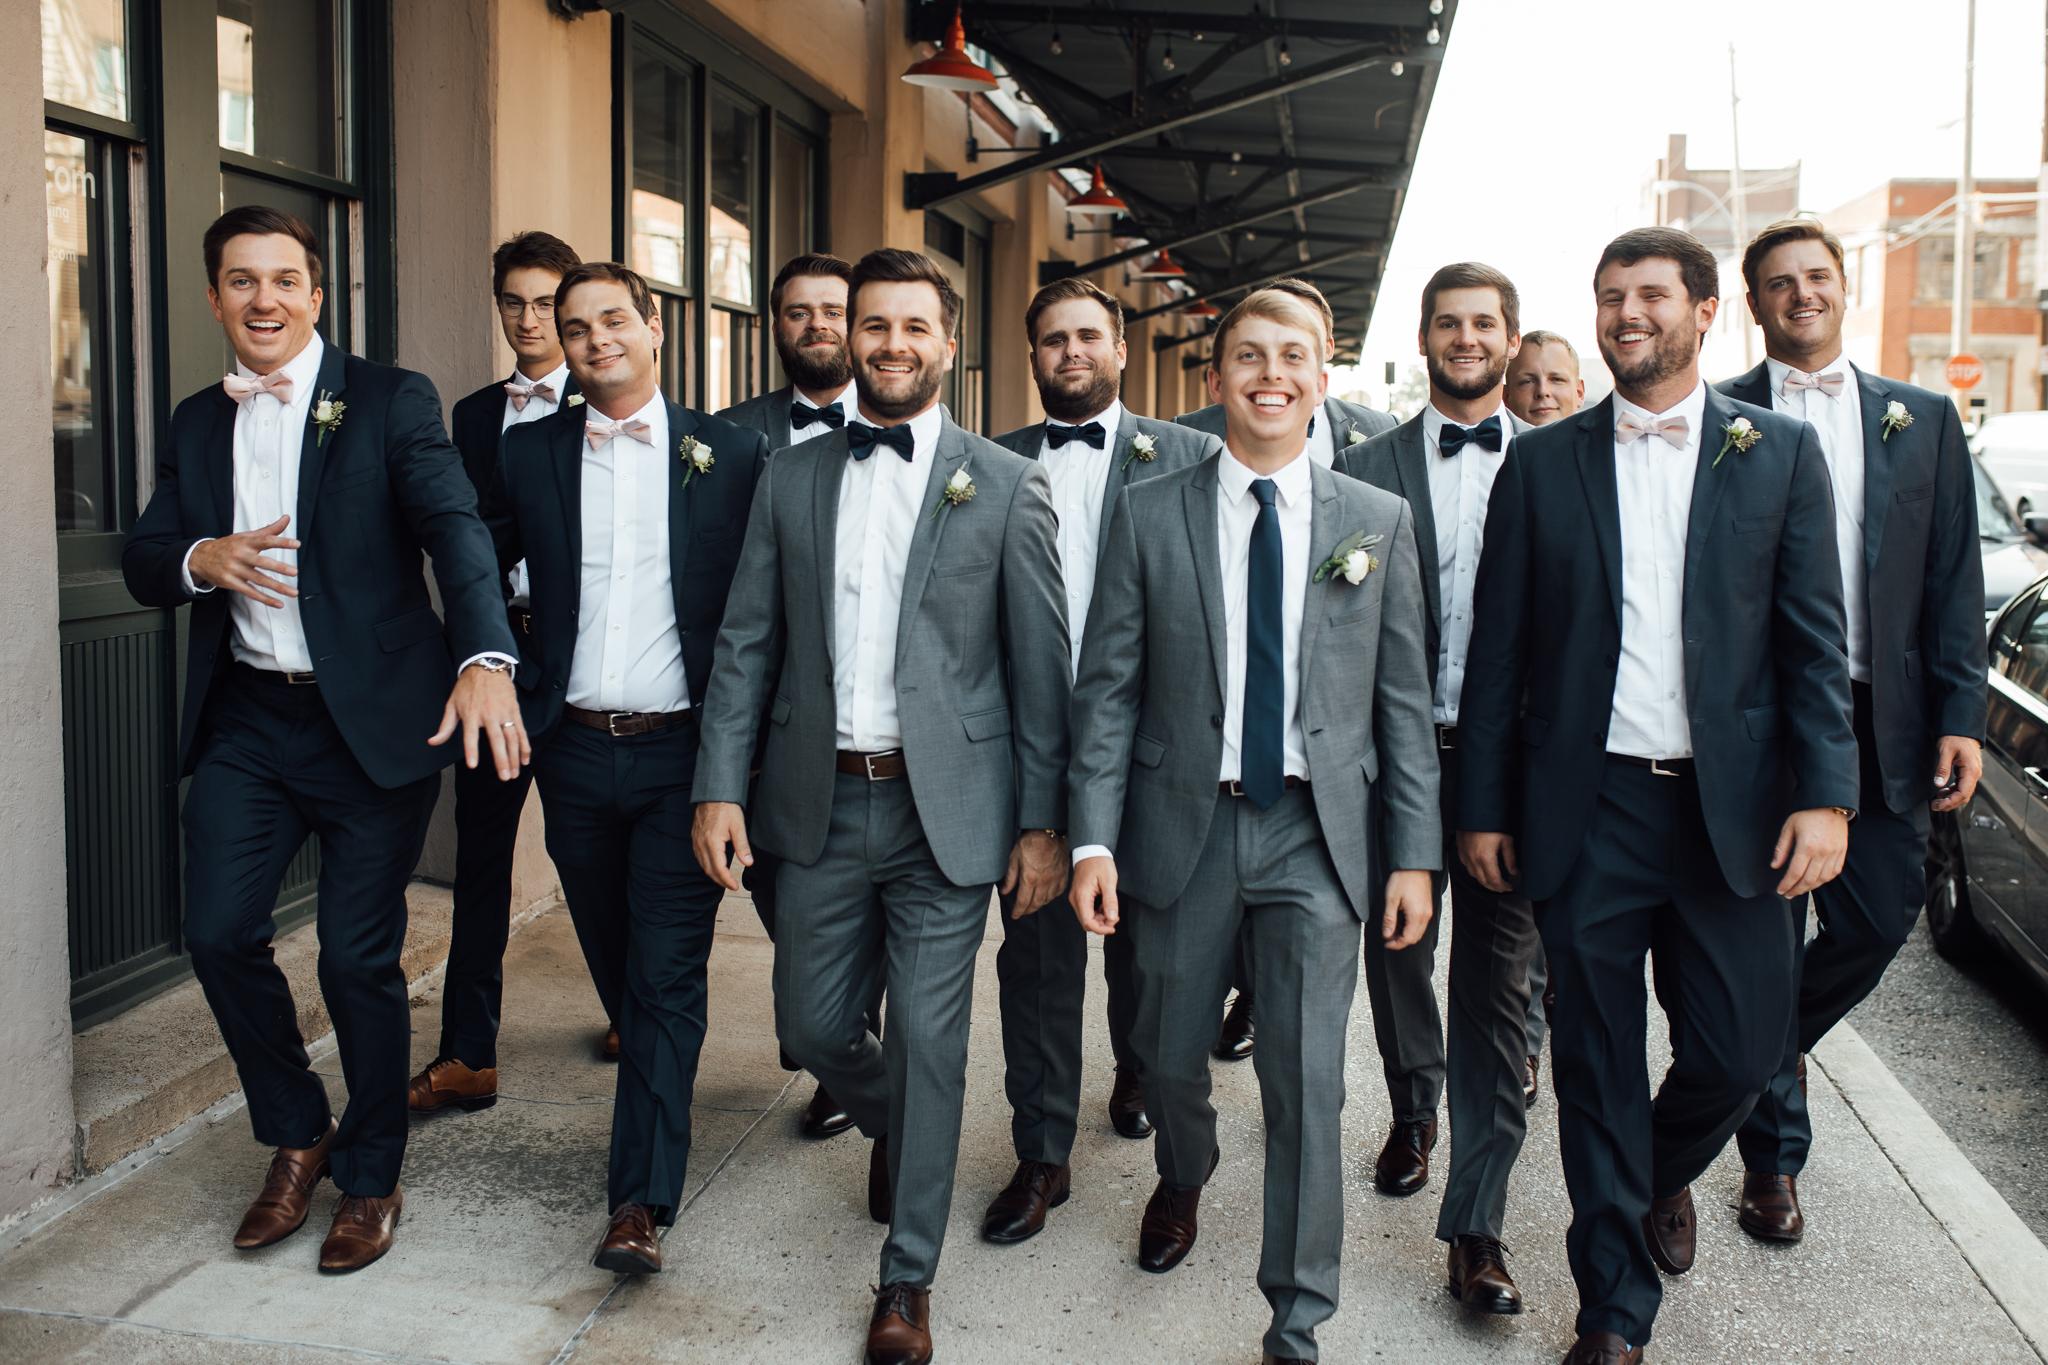 409smain-downtown-memphis-wedding-venue-thewarmtharoundyou (108 of 243).jpg